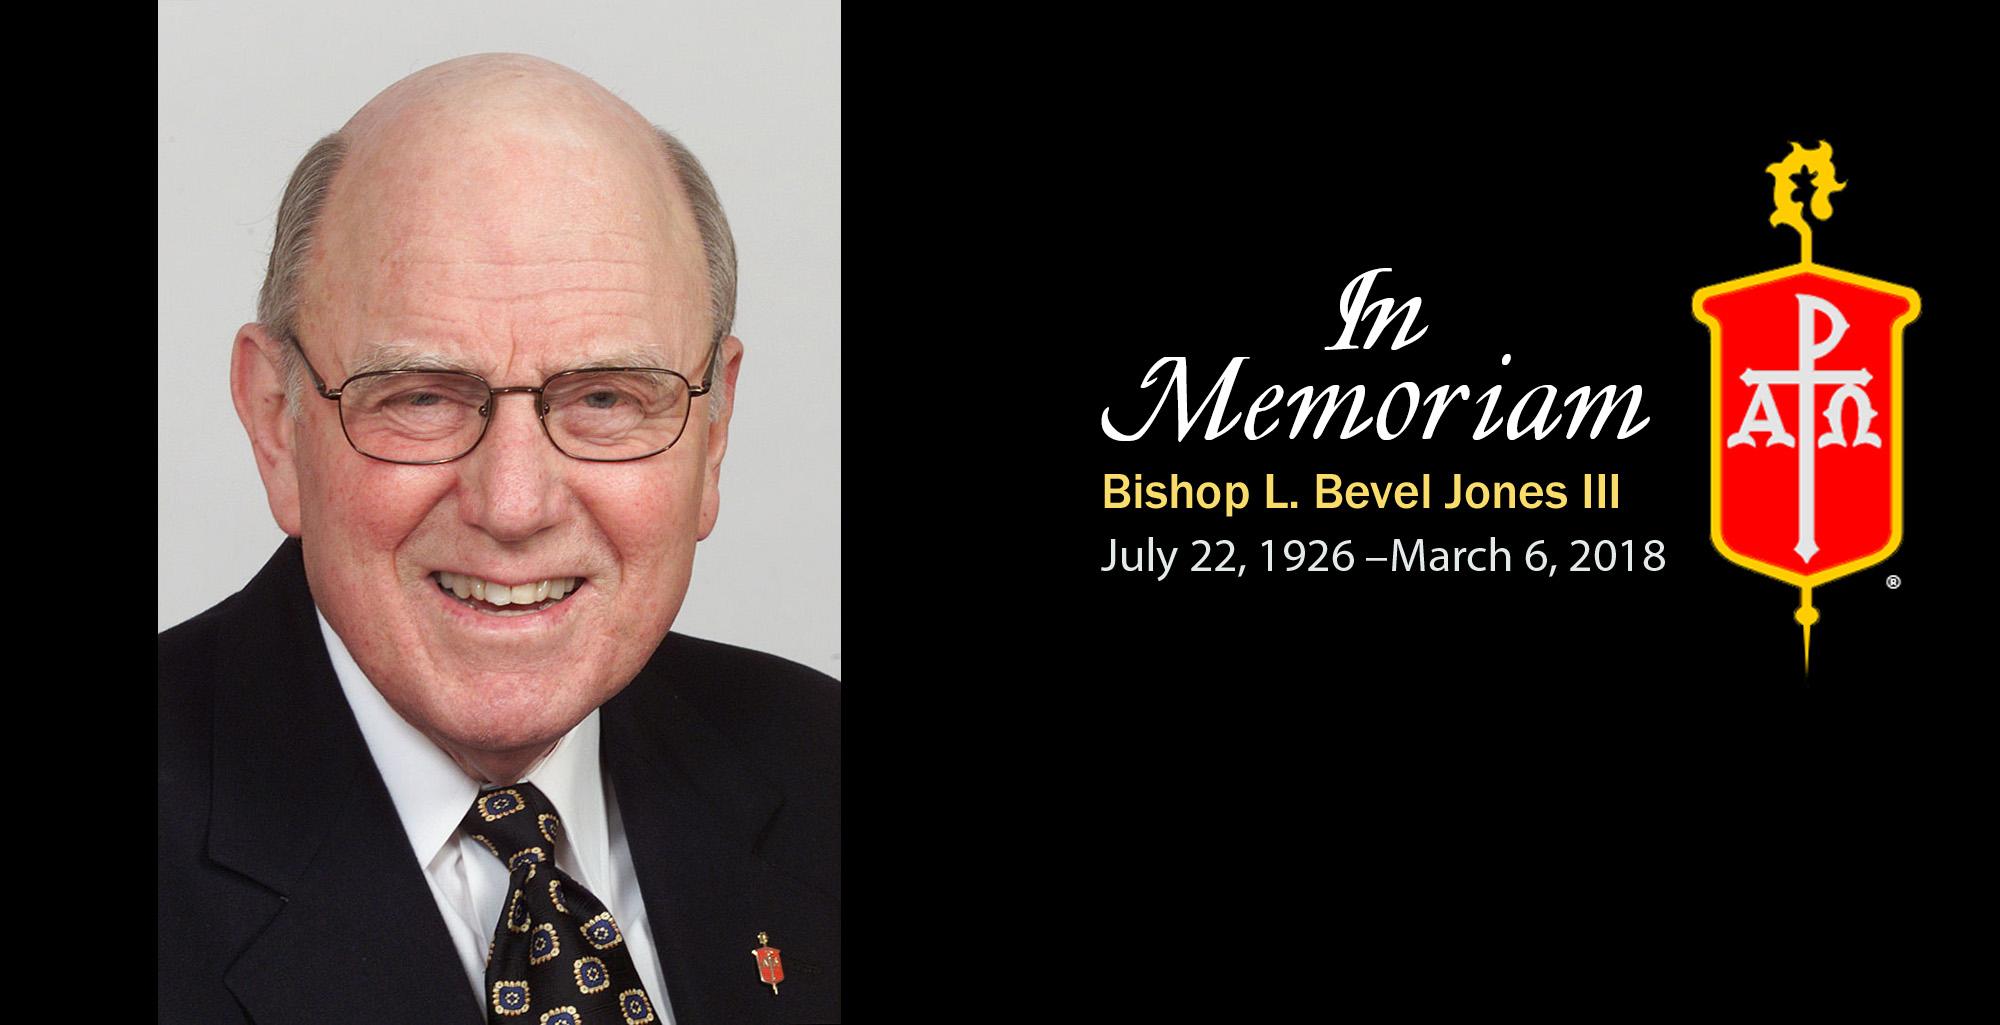 Bishop L. Bevel Jones III. Photo by Mike DuBose, UMNS.